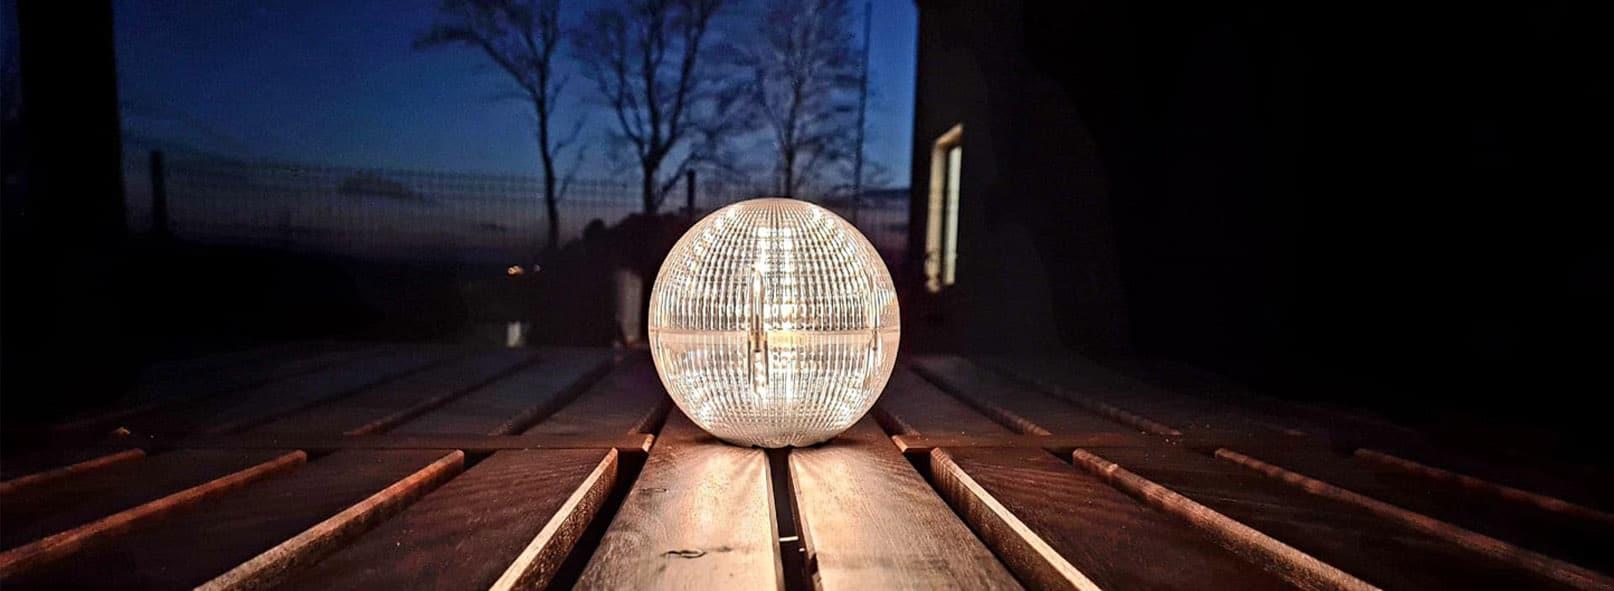 Solarna kula LED